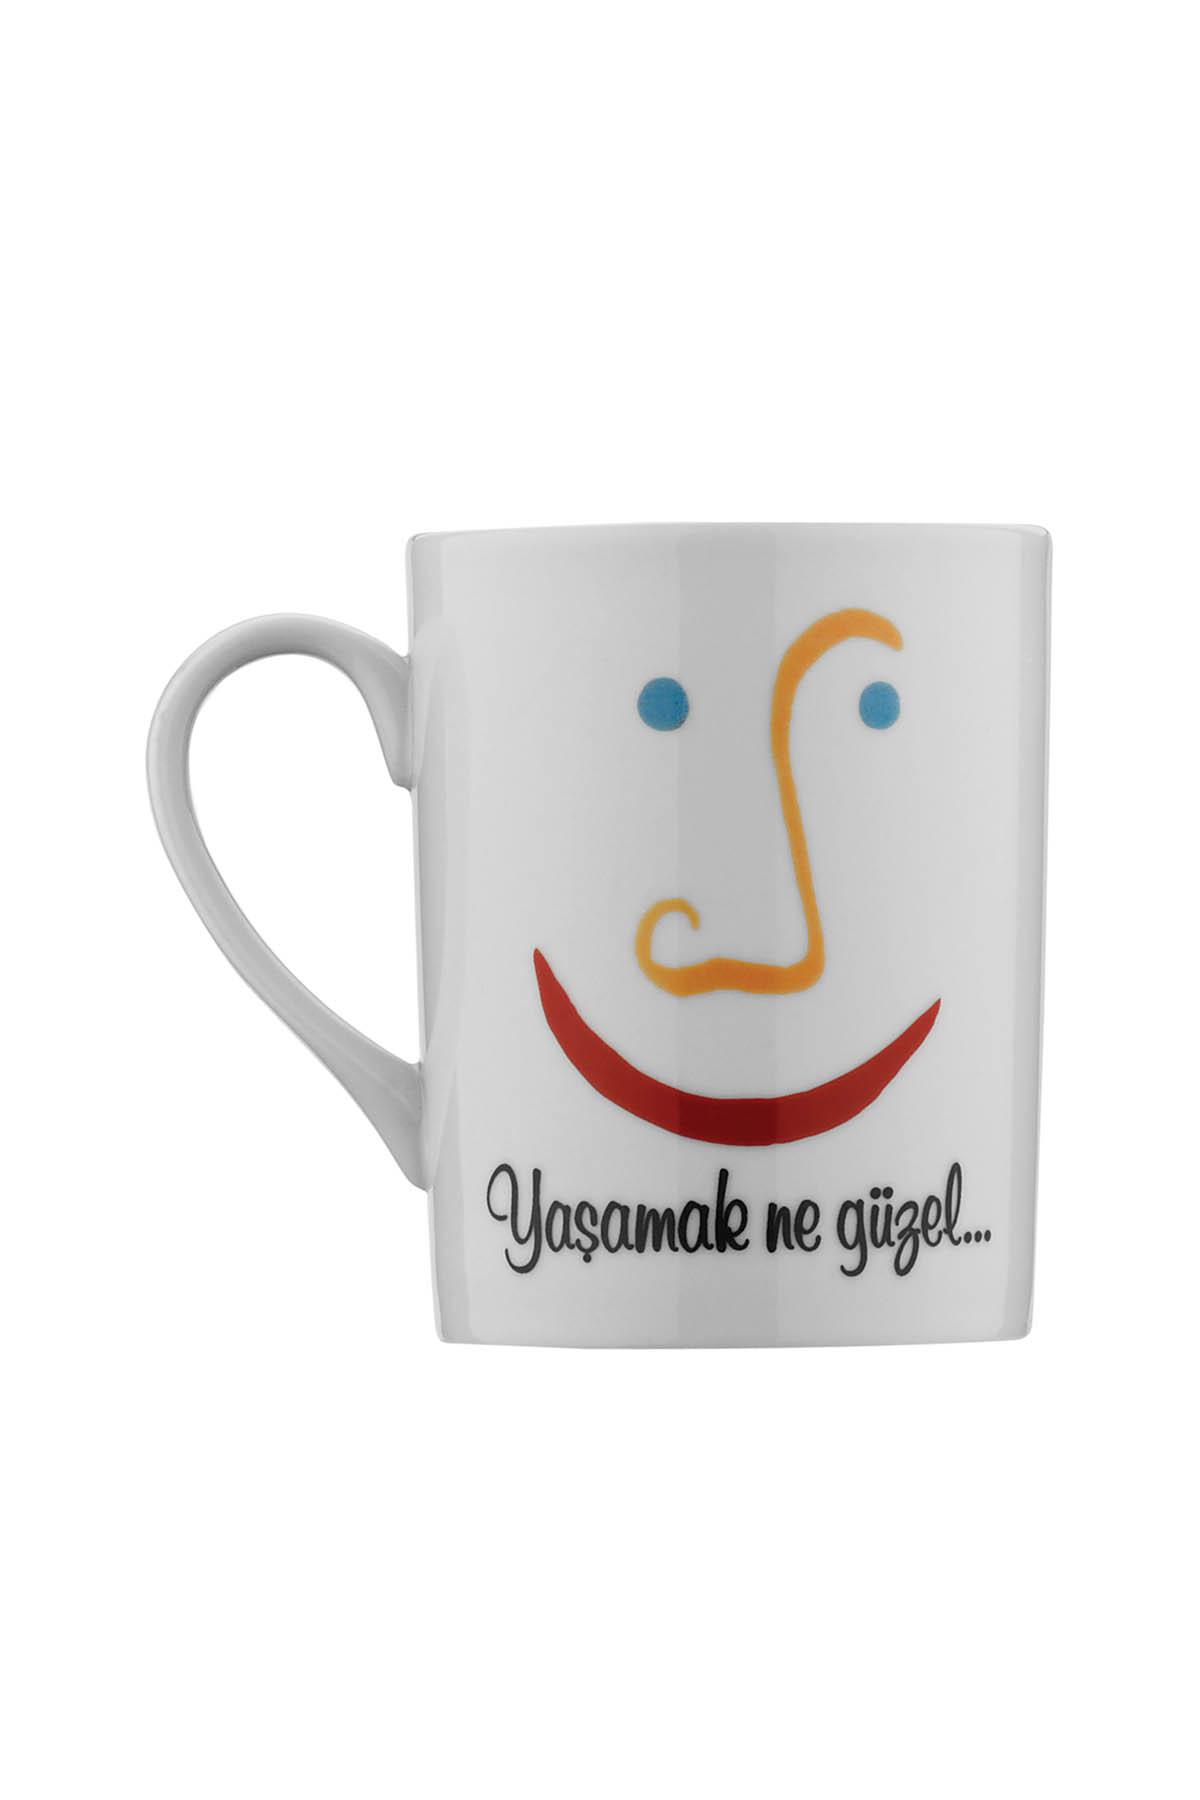 Kütahya Porselen - Kütahya Porselen Mug Bardak 107592